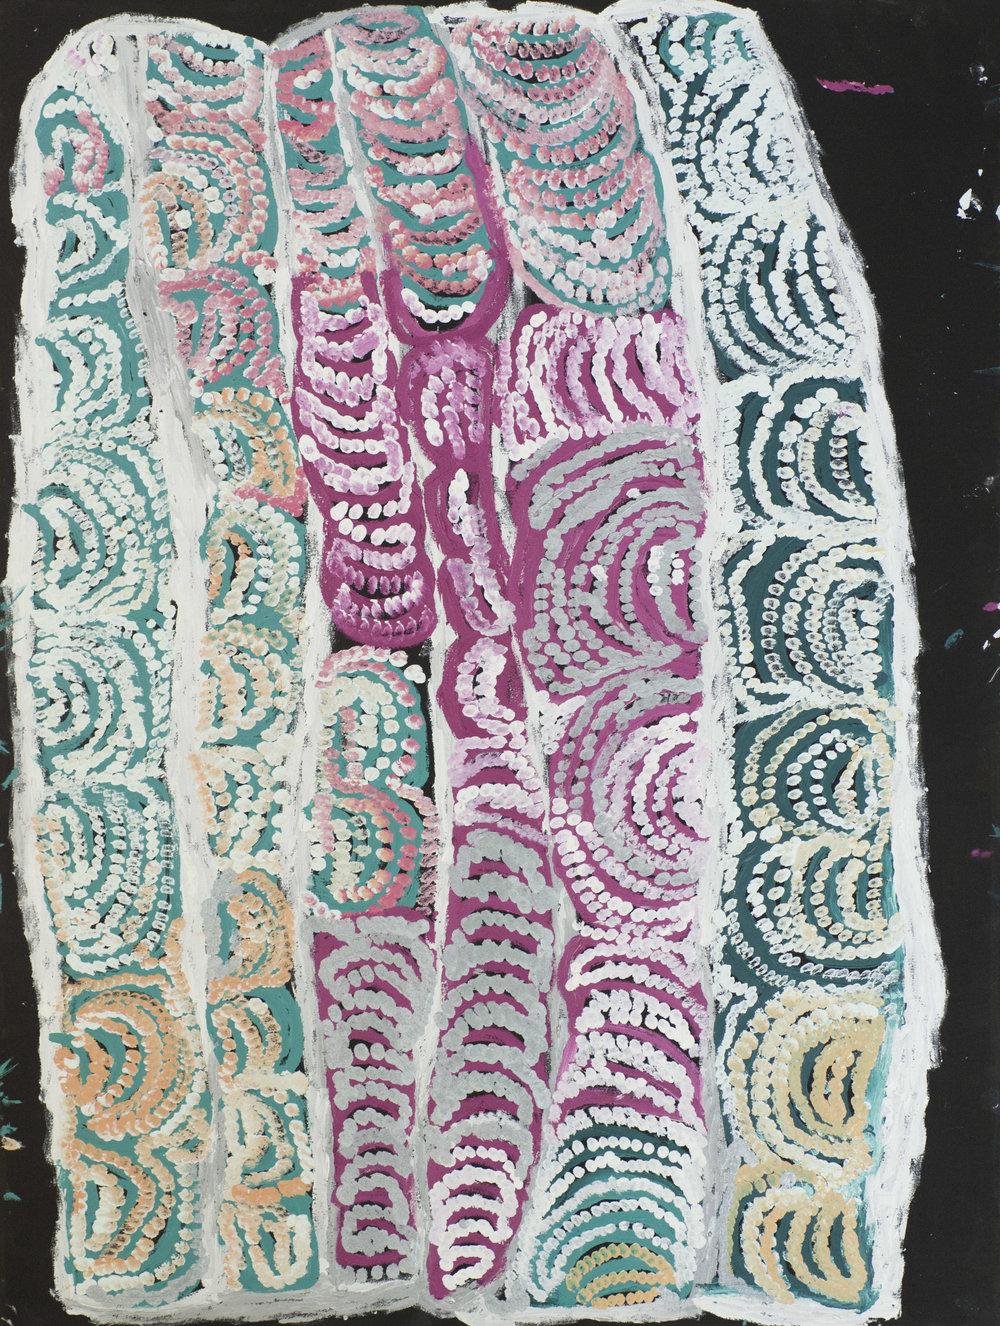 "NYARAPAYI GILES  Warmurrungu  38"" x 47"" (119.6 x 89.5 cm) Acrylic on Belgian linen Tjarlirli Artists catalog #14-589   EMAIL INQUIRY"